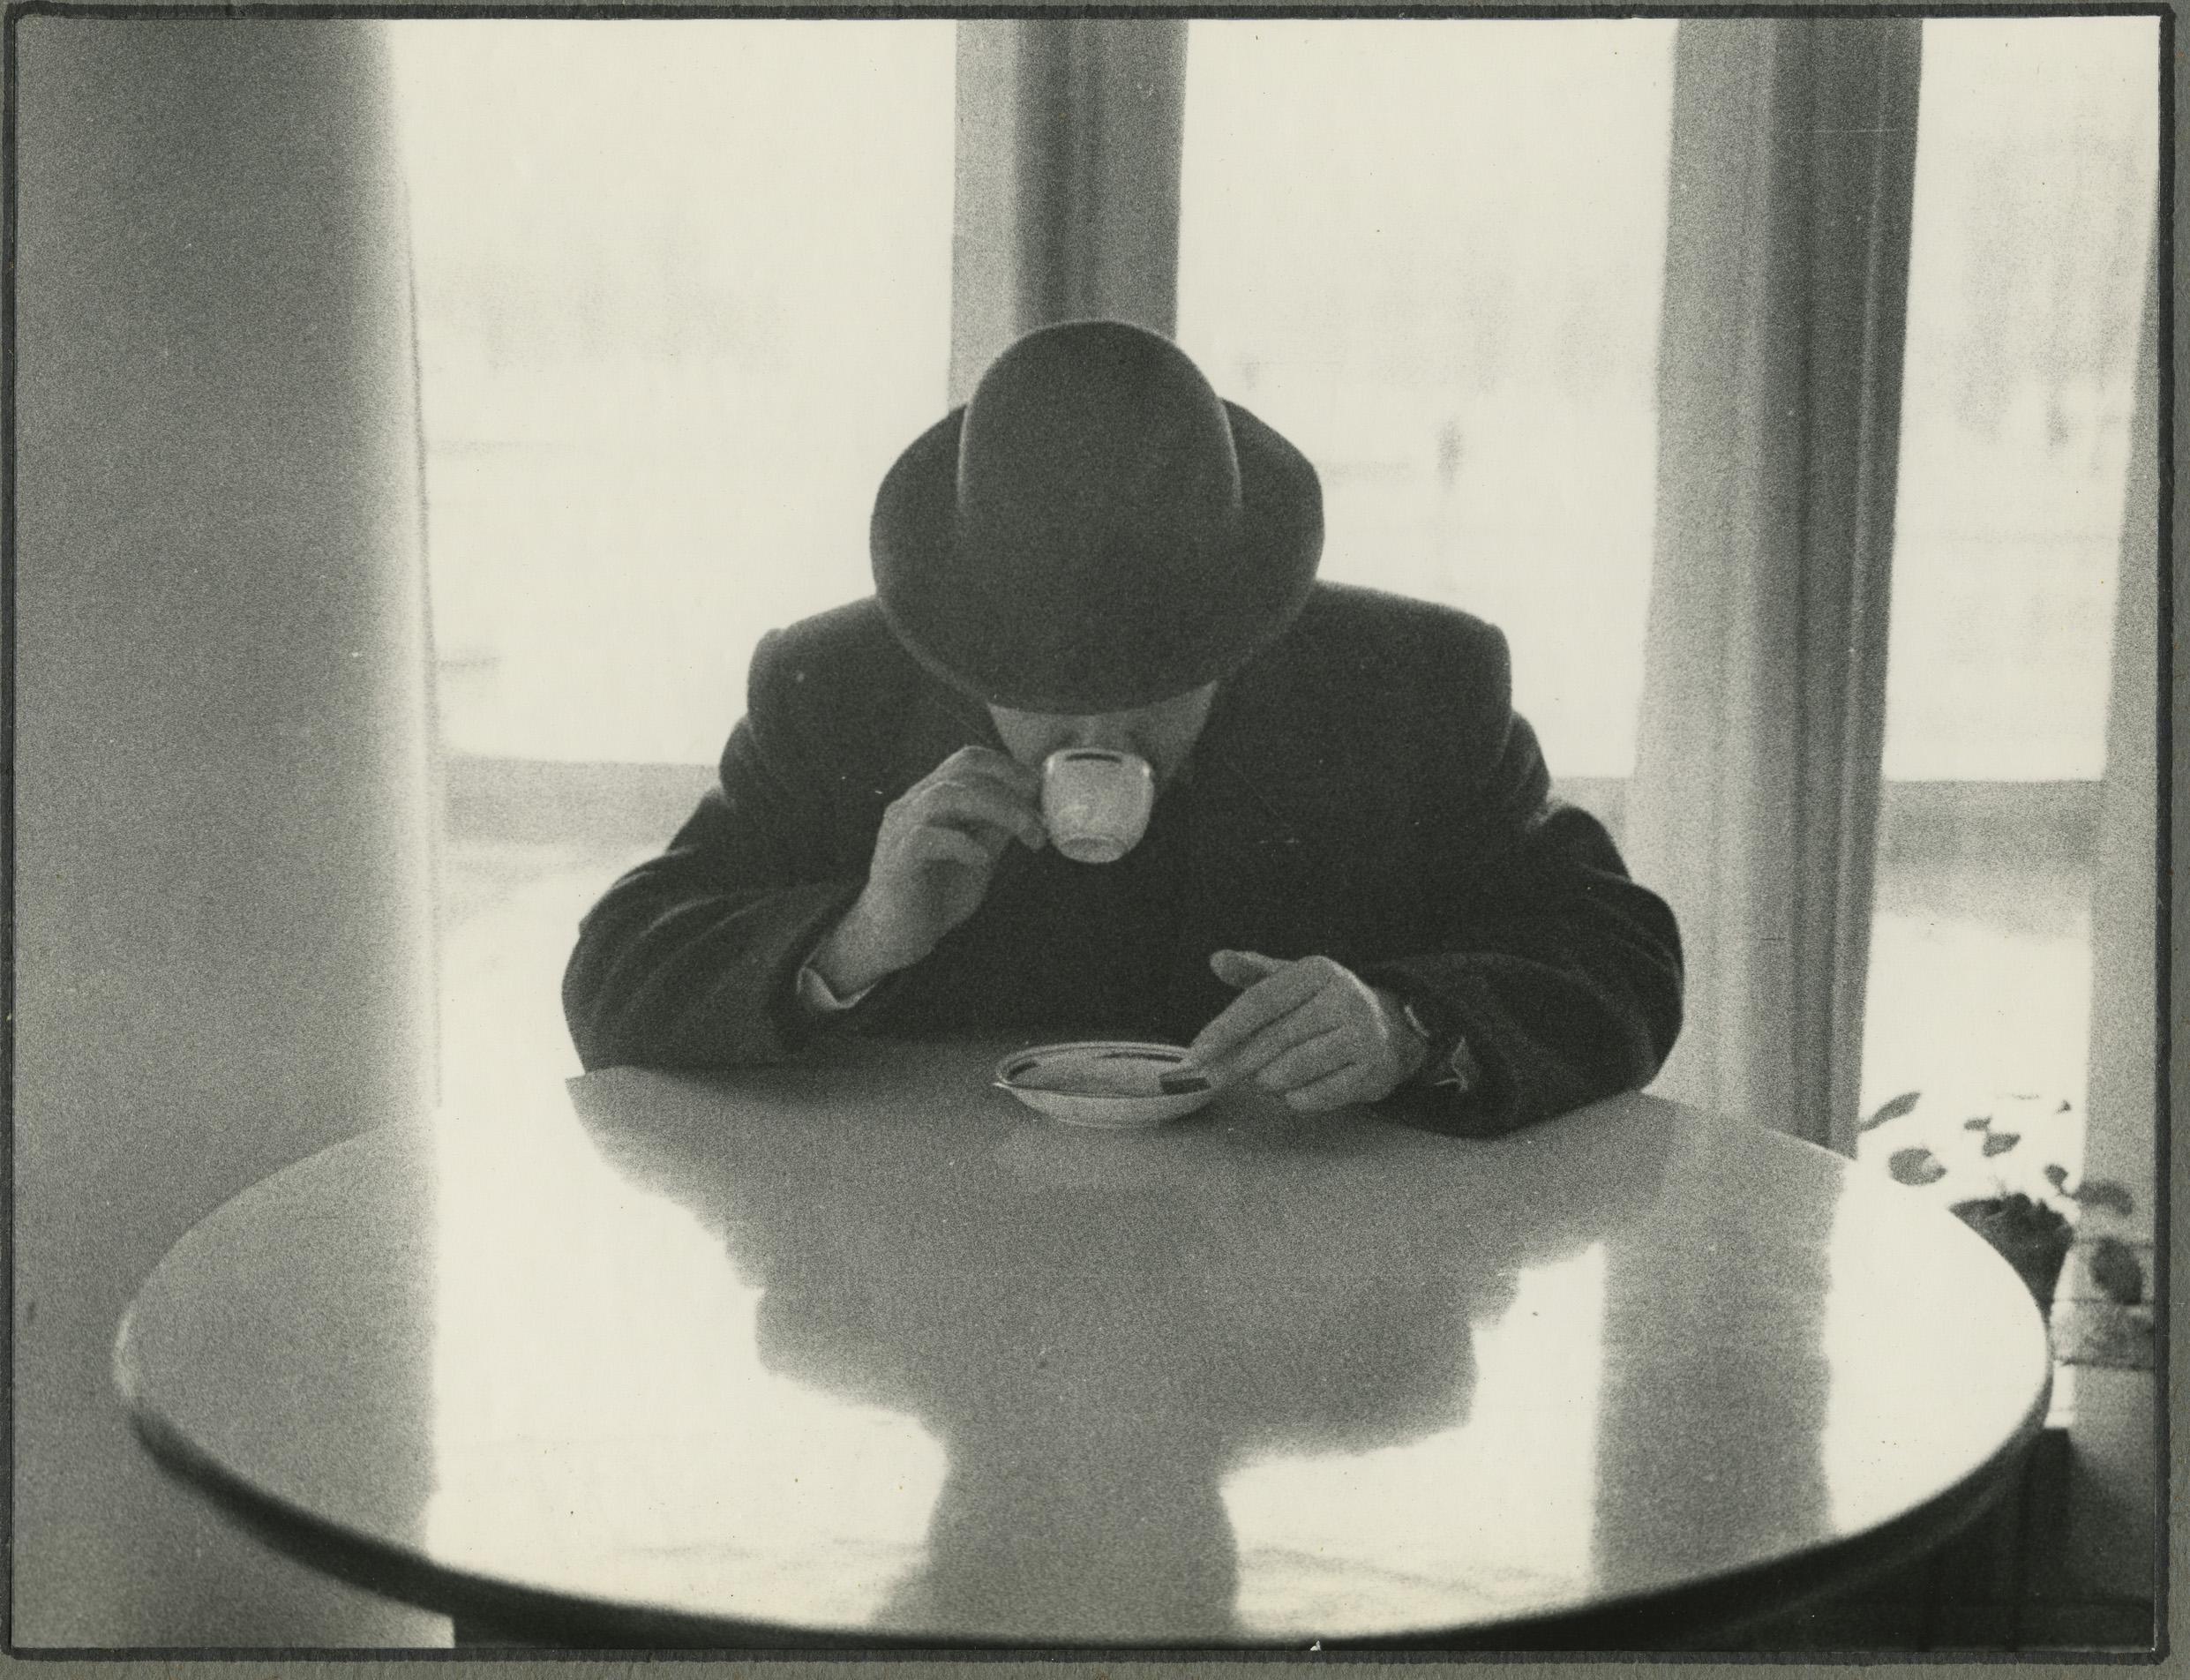 Александр Слюсарев. Весна. 1972. Серебряно-желатиновый отпечаток.